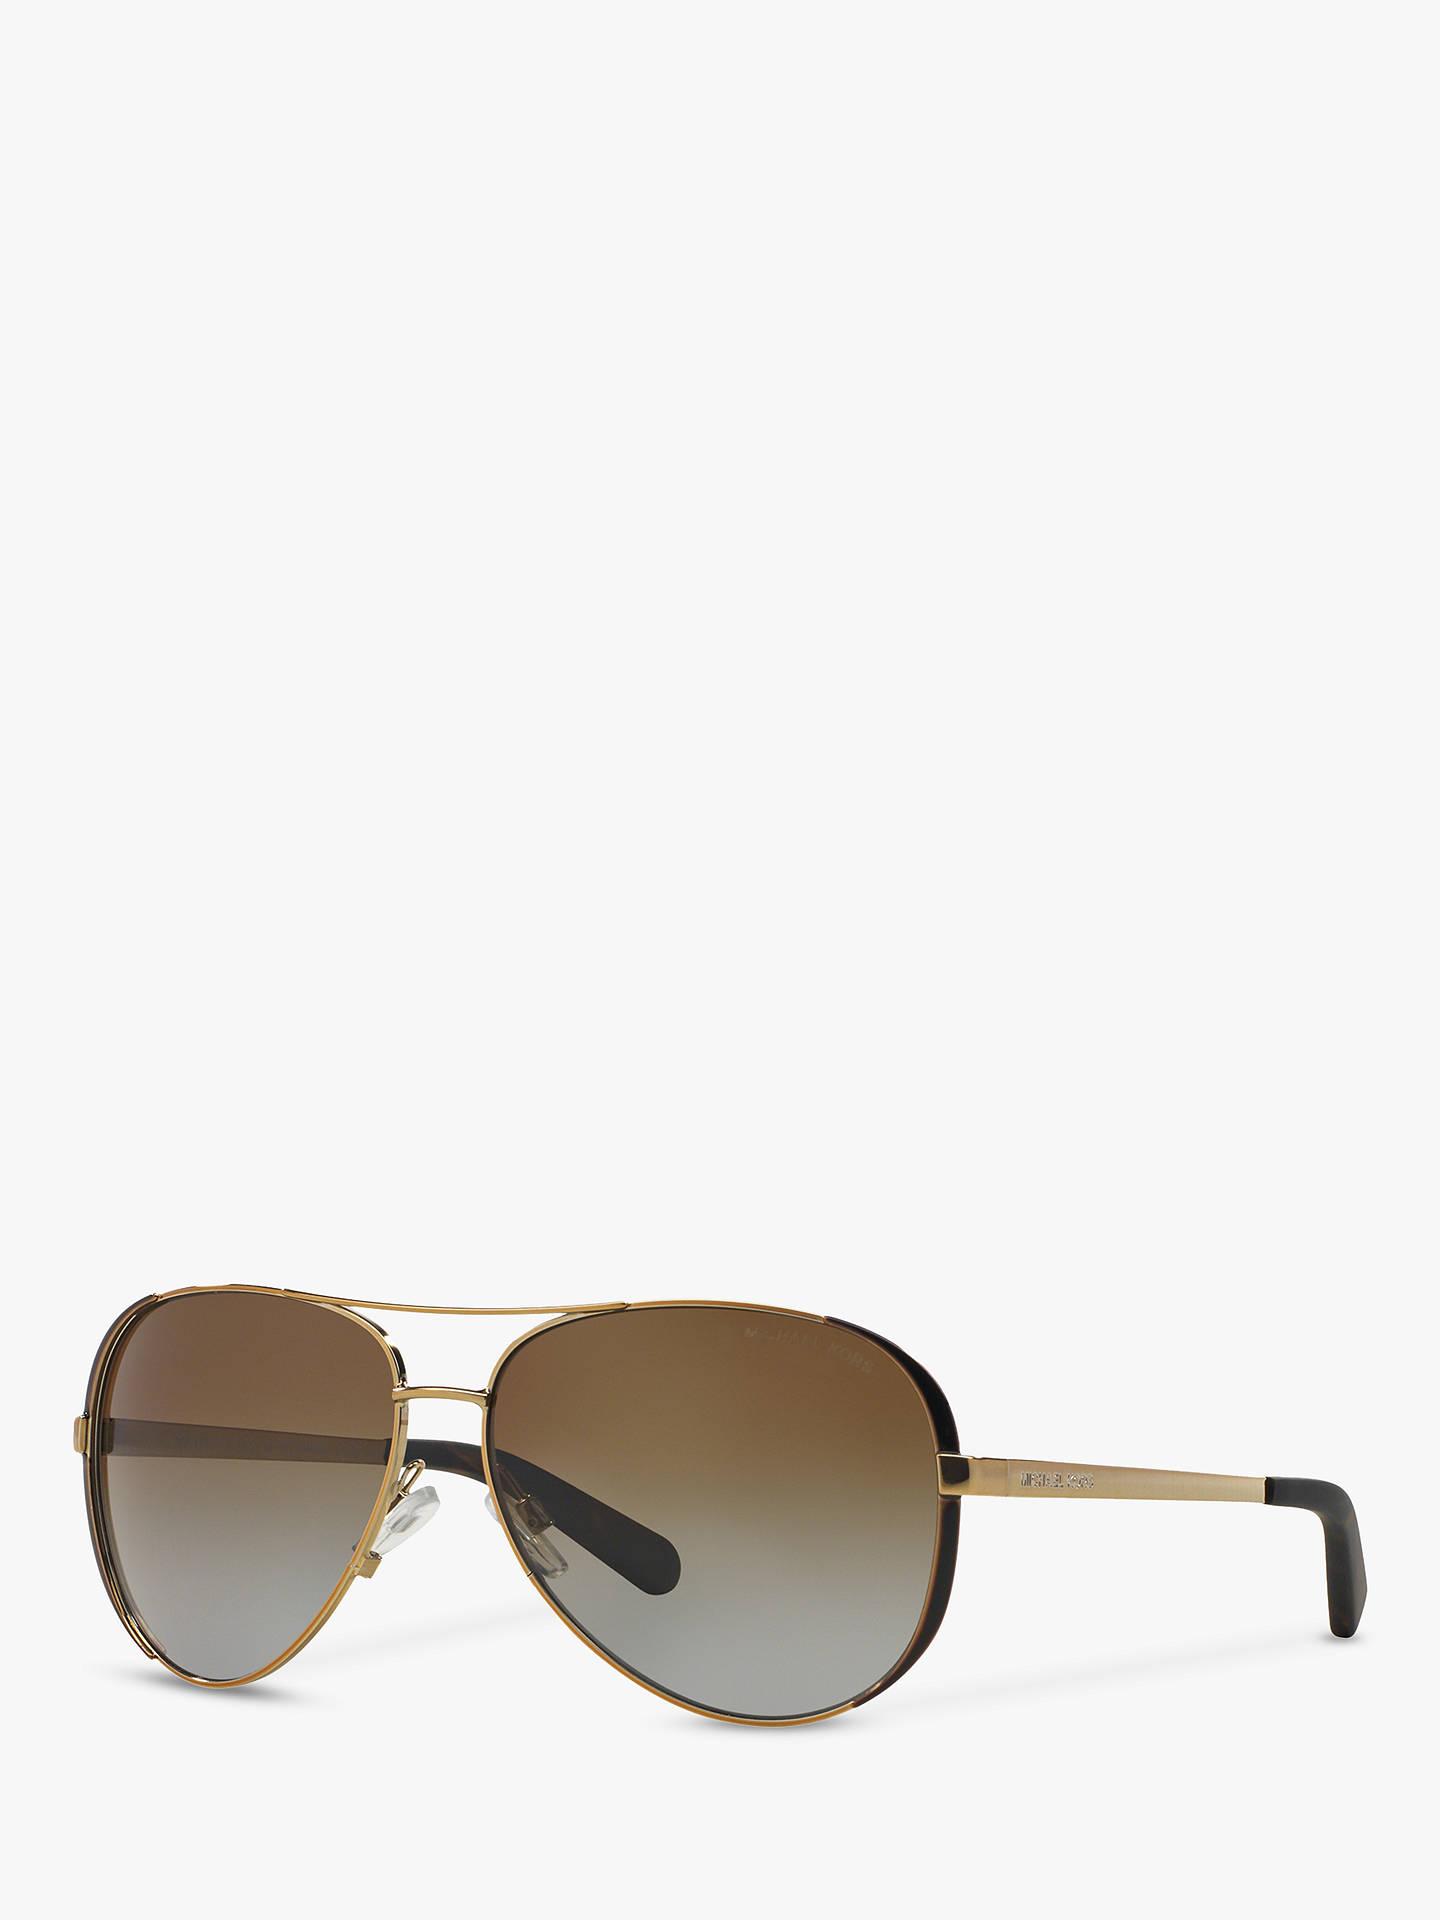 b3ed006417 Buy Michael Kors MK5004 Chelsea Polarised Aviator Sunglasses